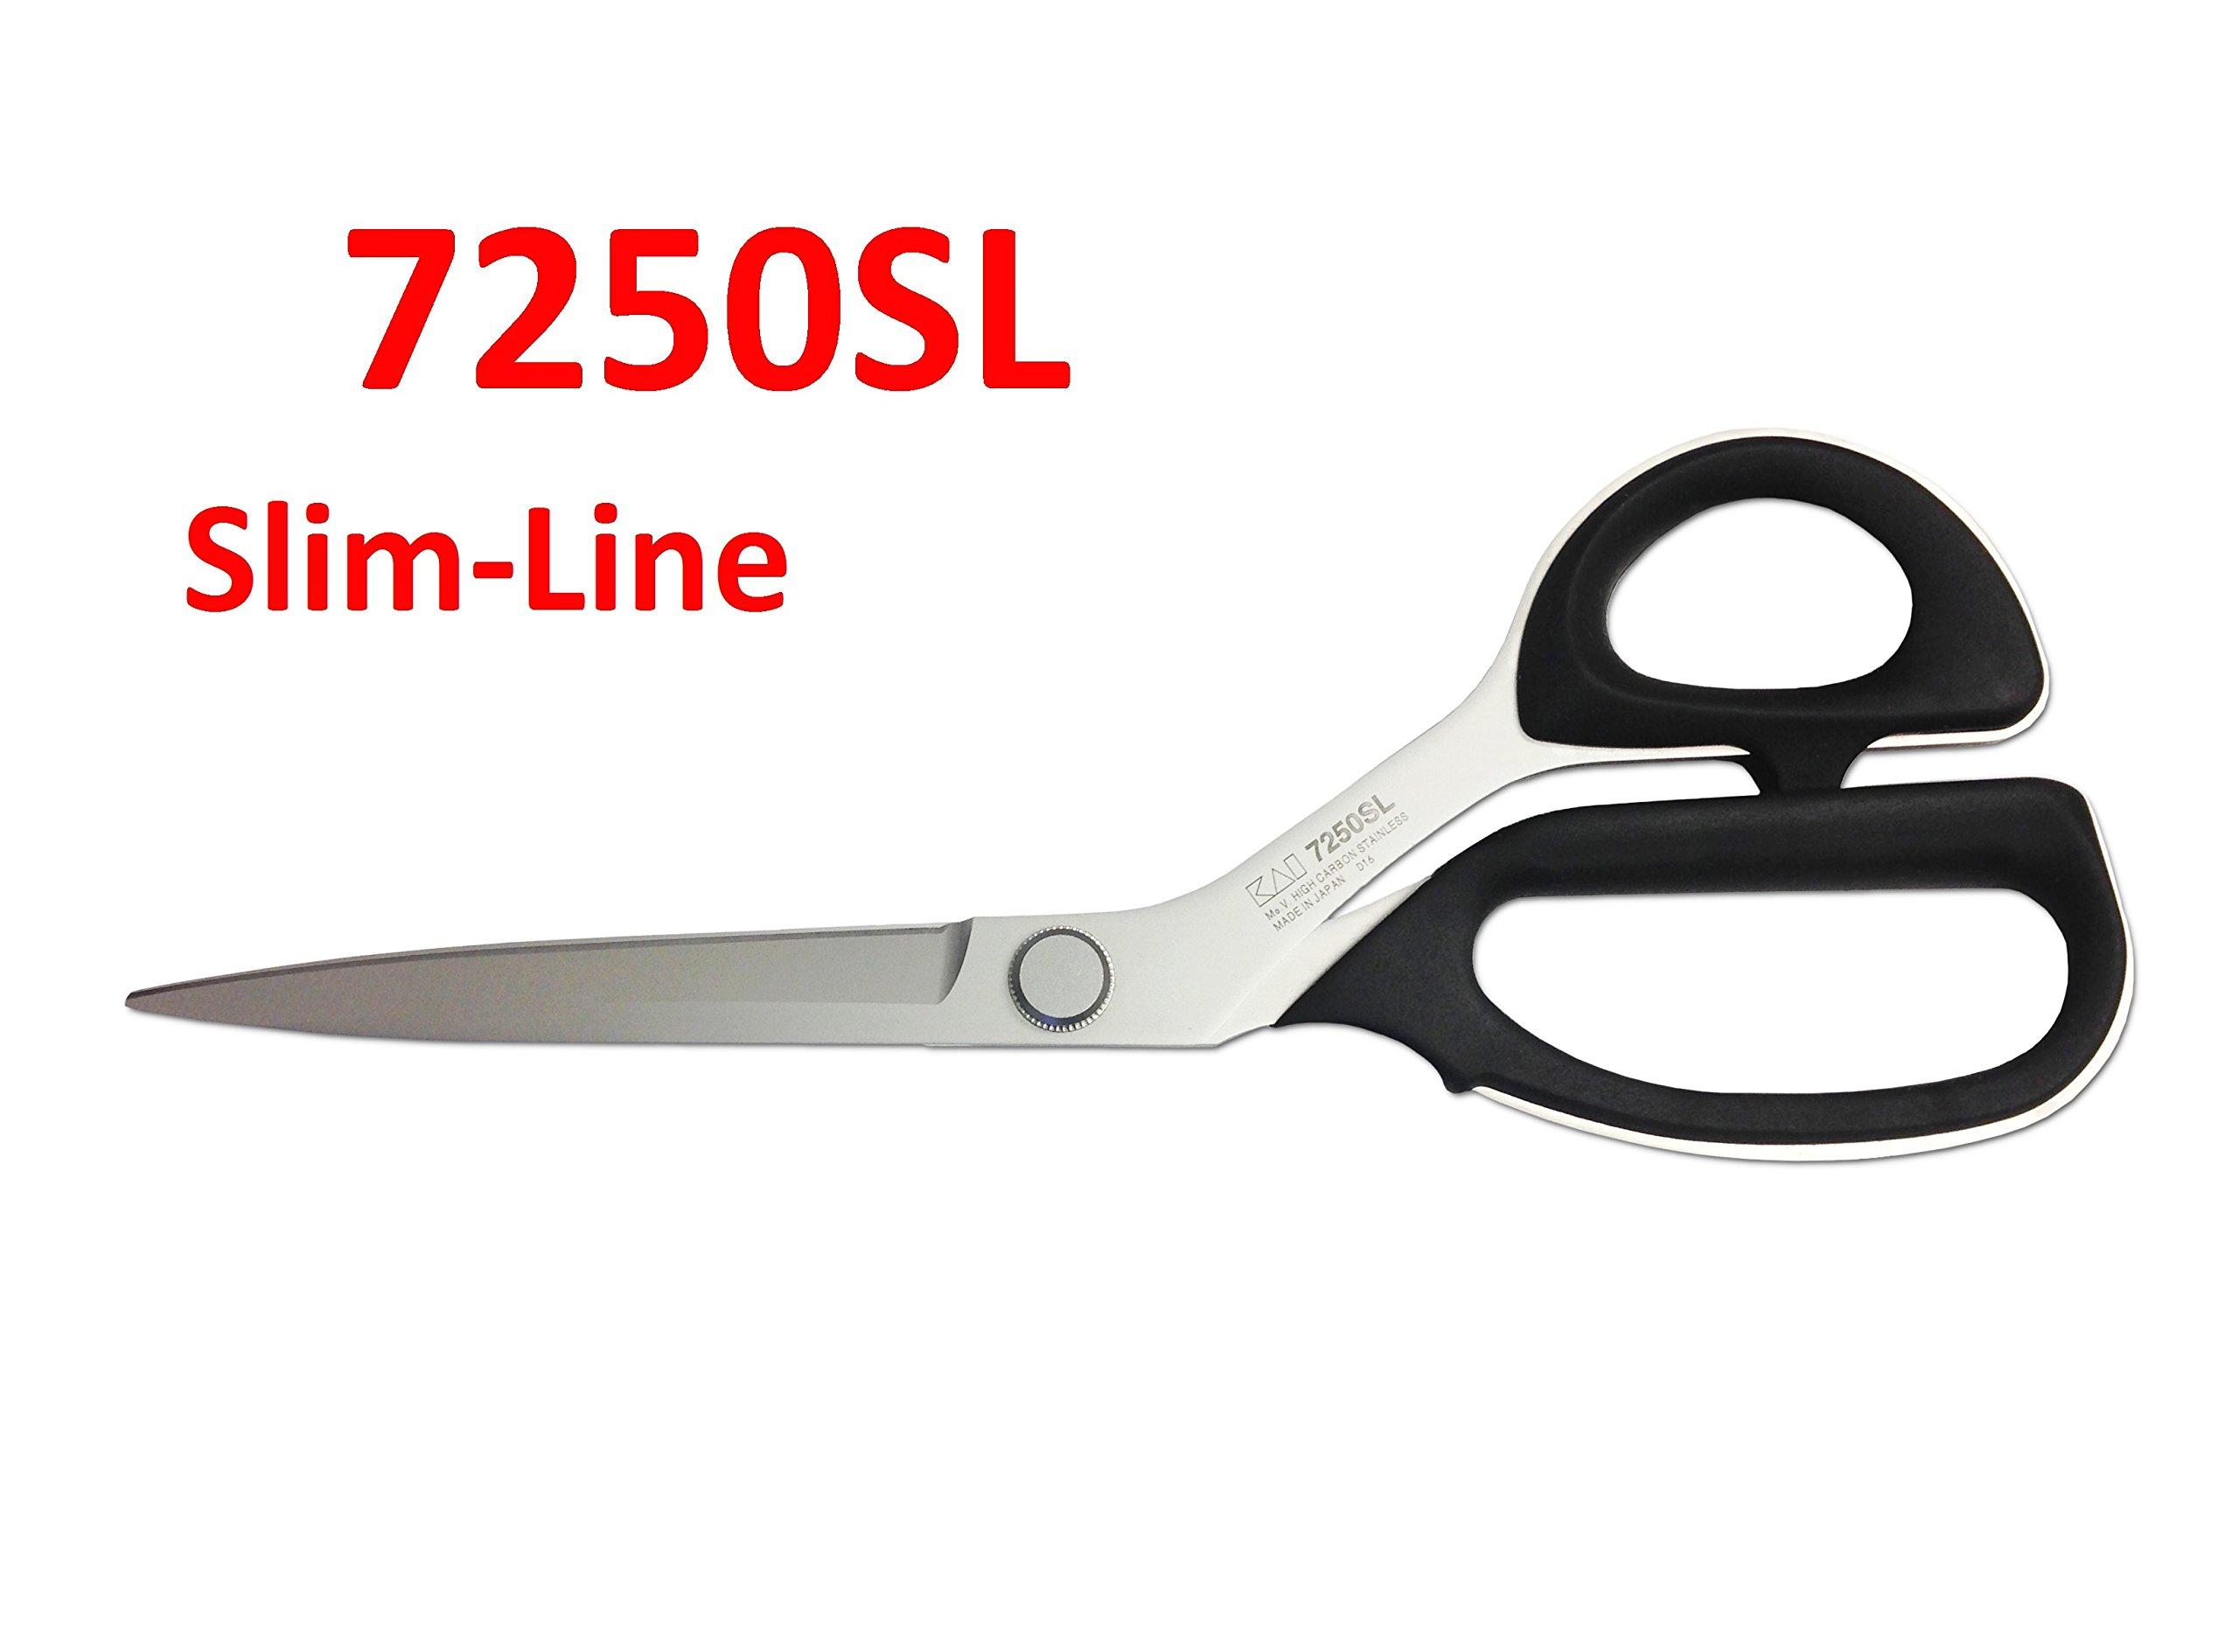 Kai 7250SL 10 Inch Professional Shears (Slim Line) by Kai (Image #1)